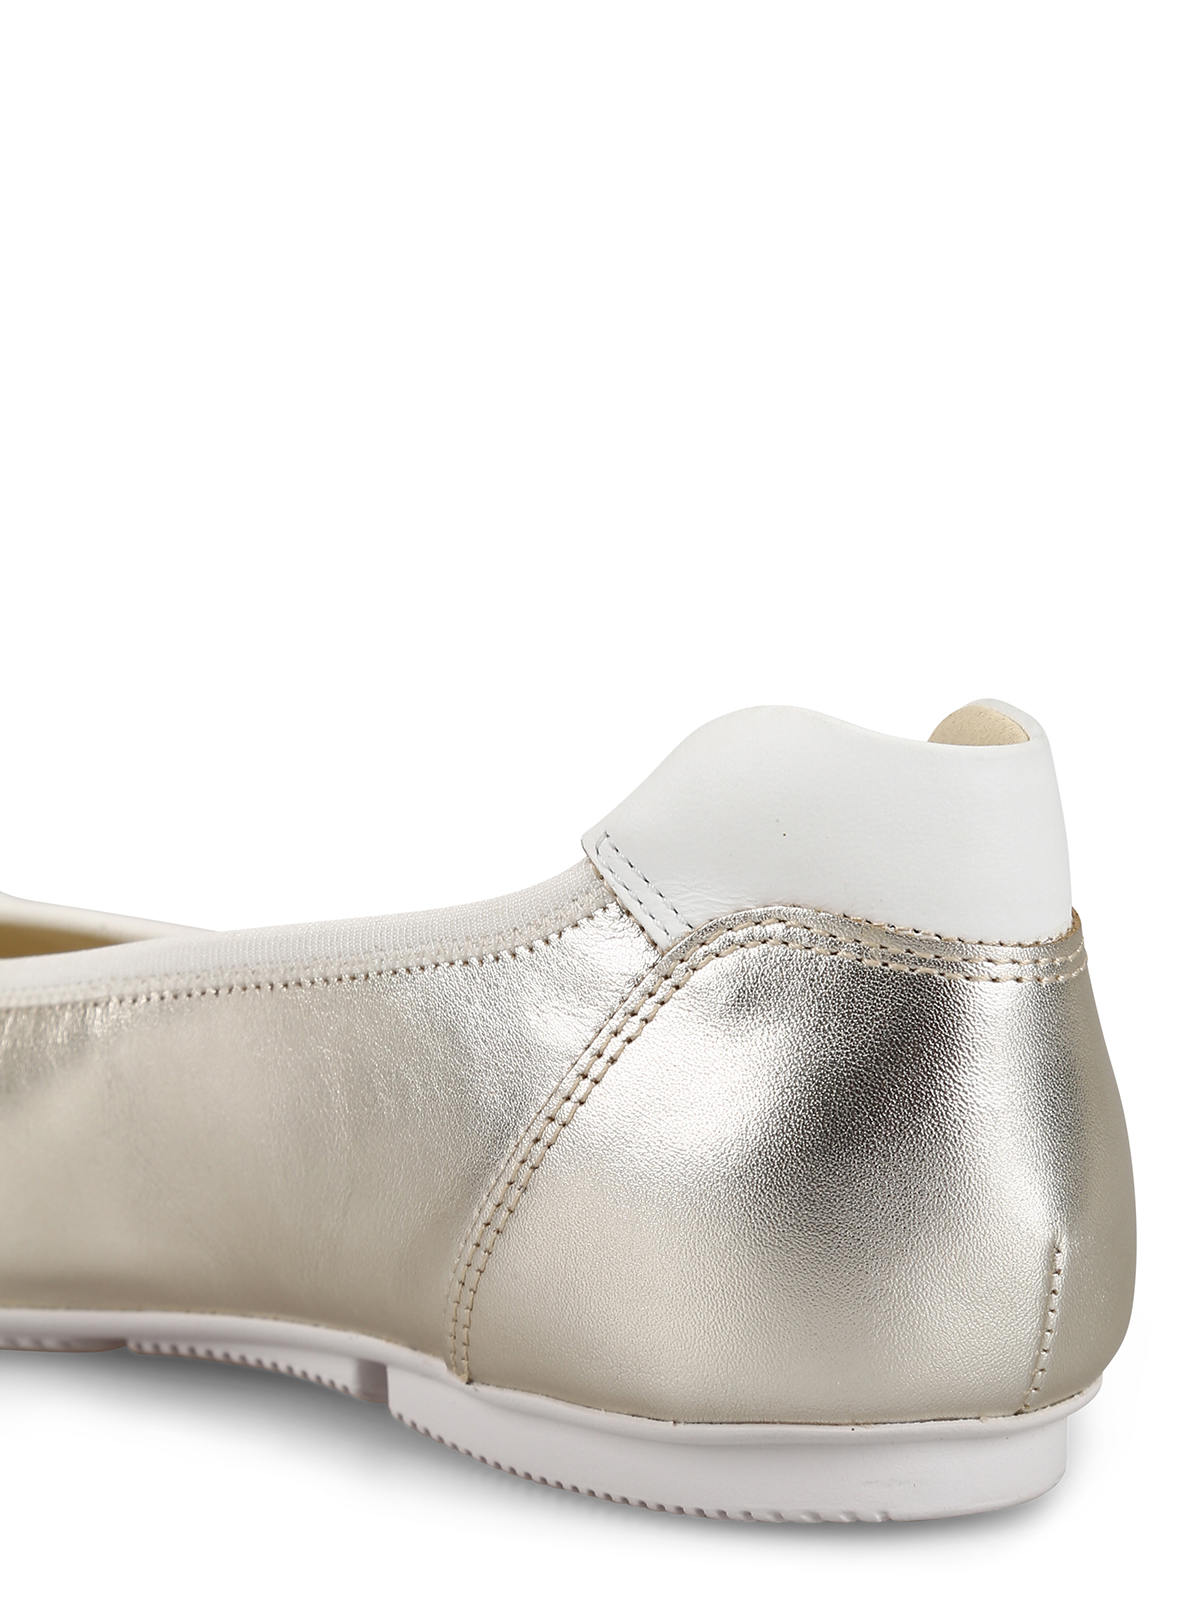 82ecde7eb0935 Hogan - Ballerine Wrap-H144 in pelle oro pallido - ballerine ...